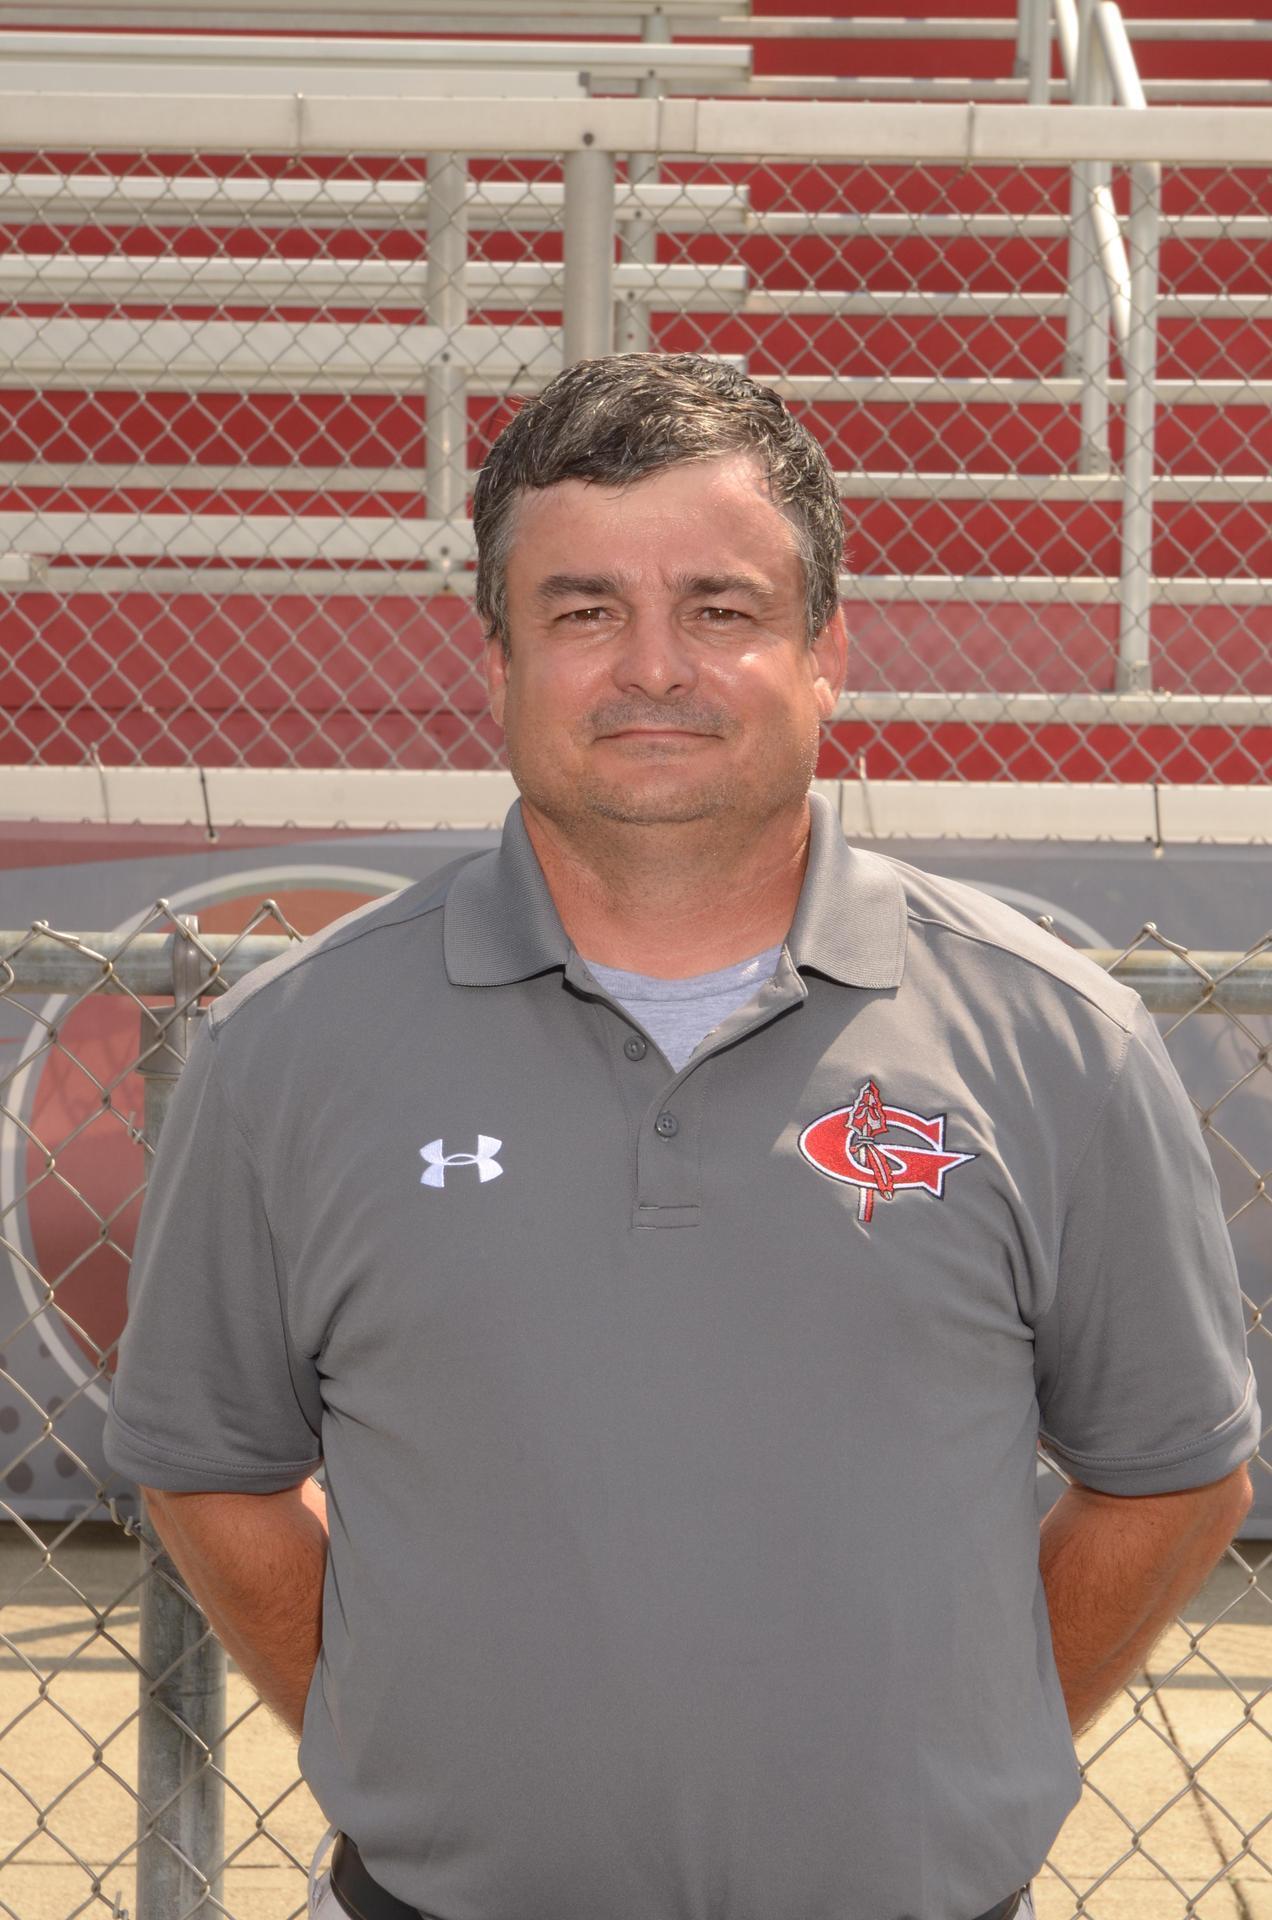 Coach Mowry